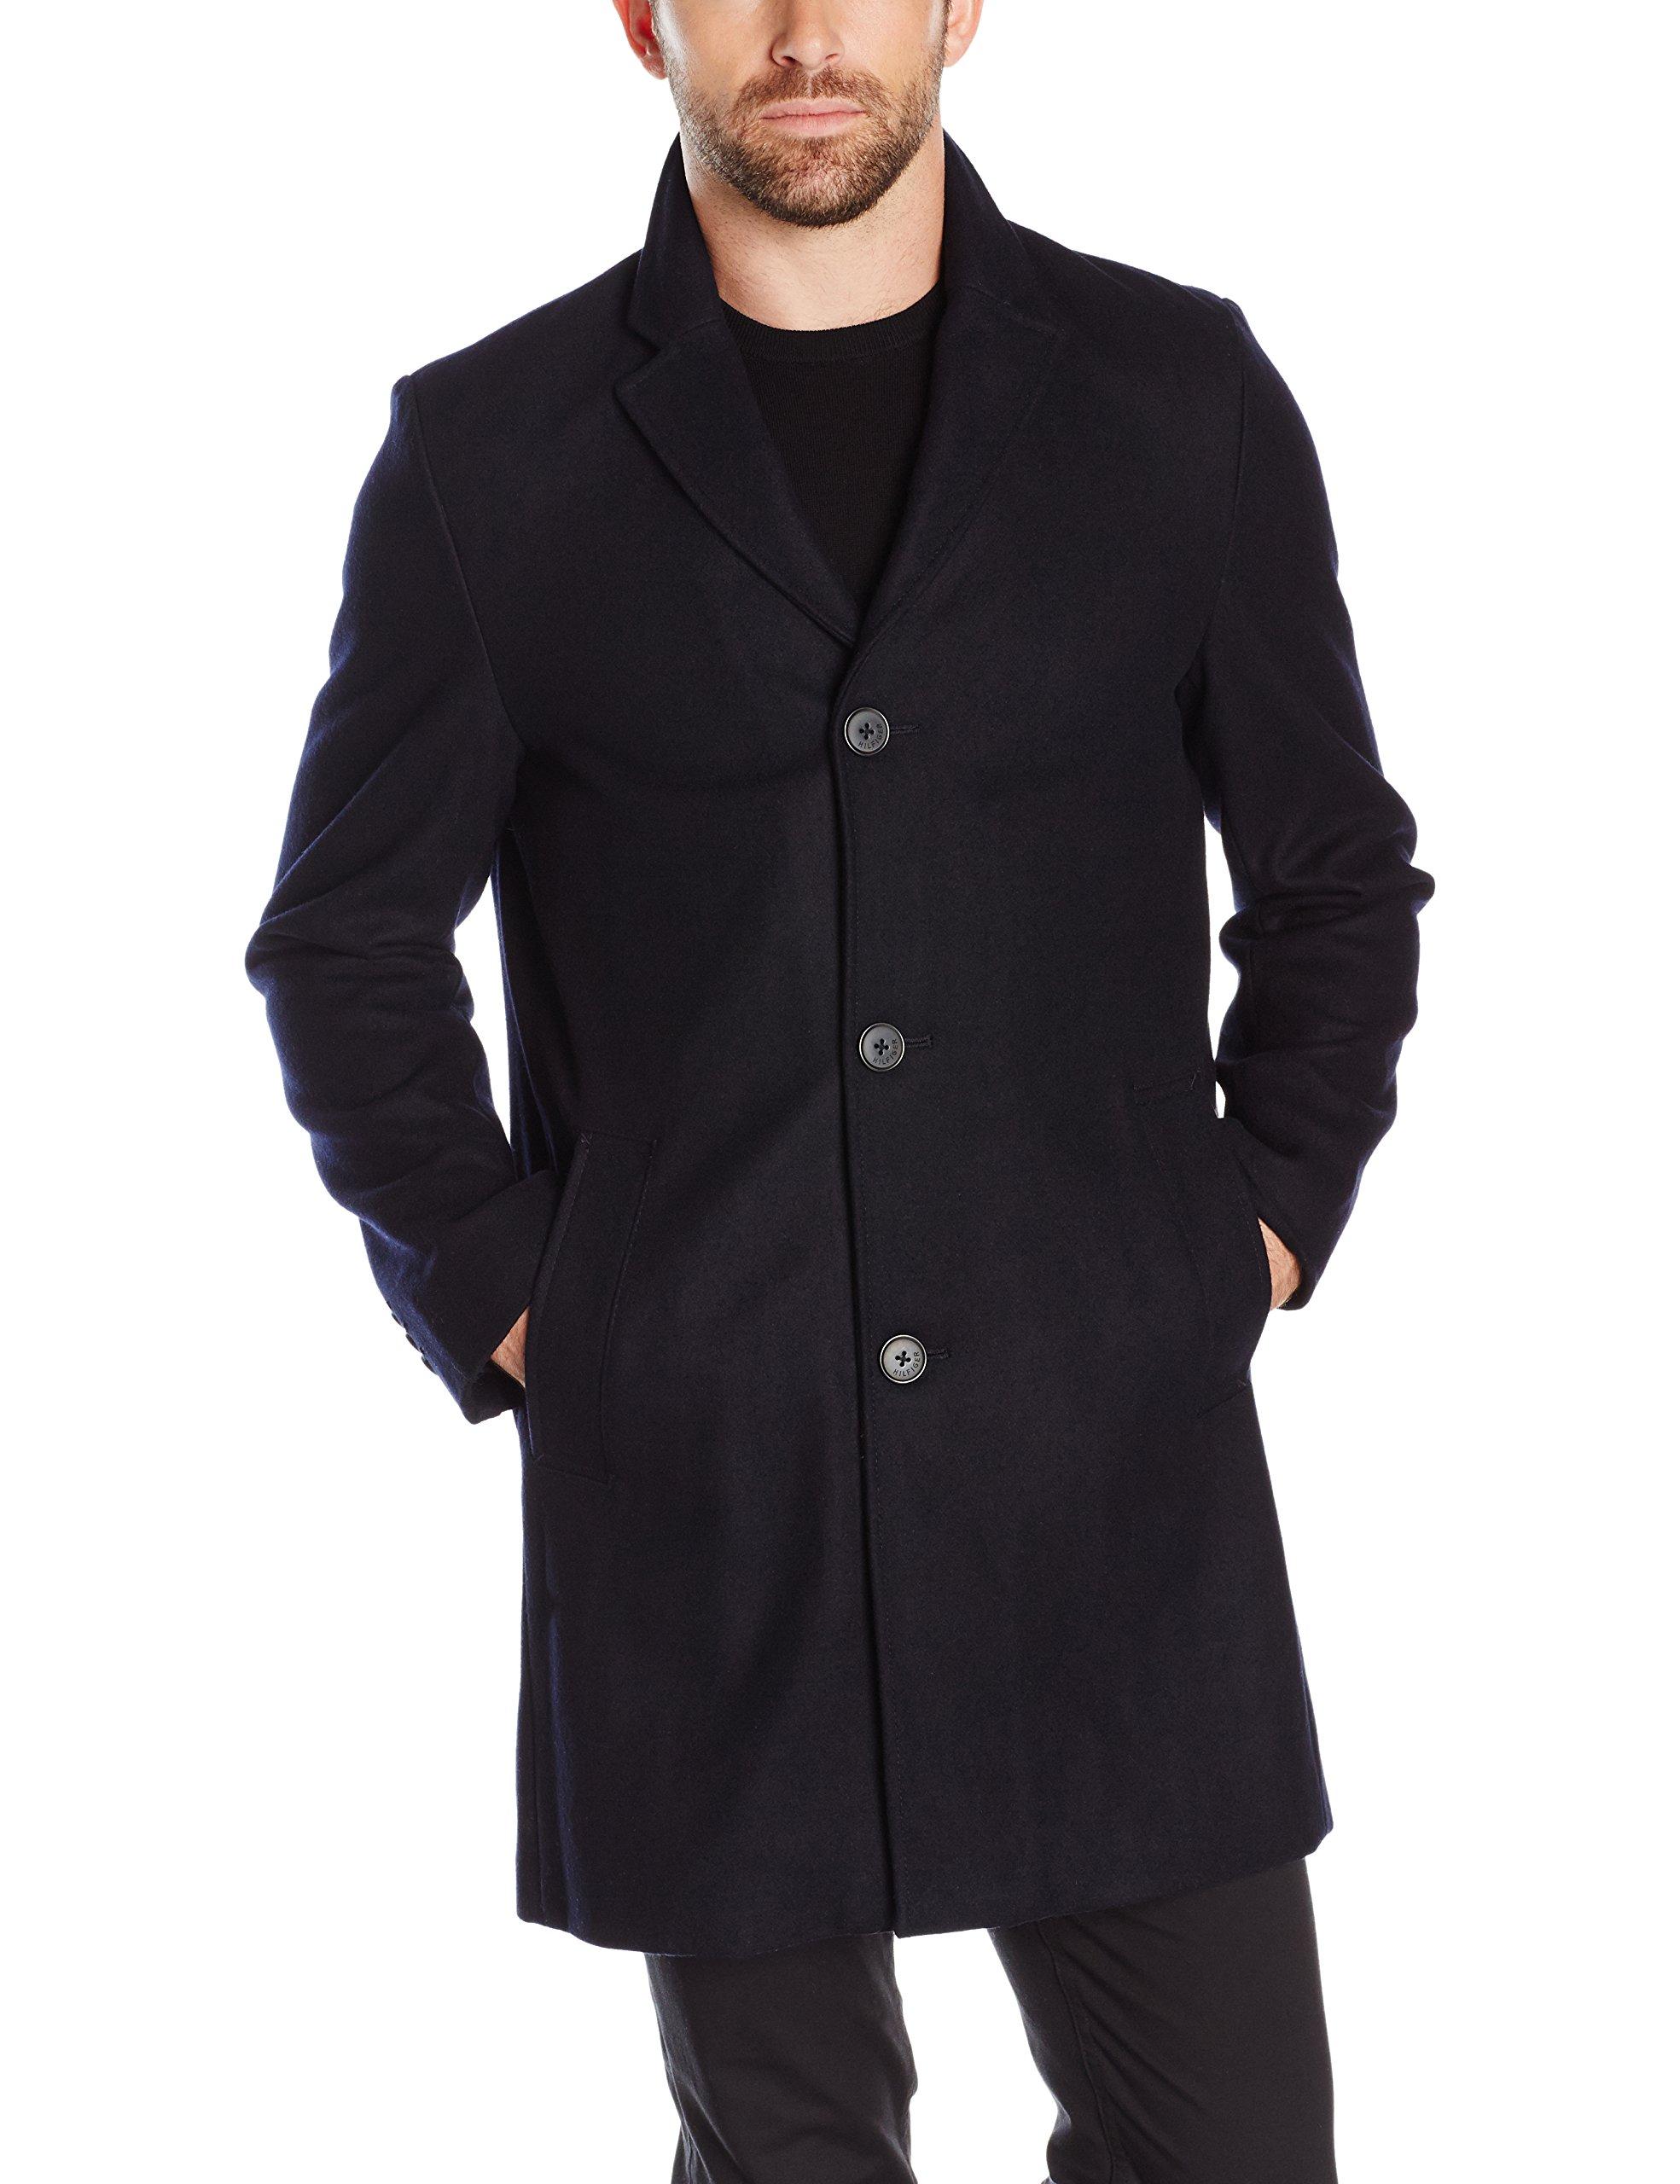 Tommy Hilfiger Men's Wool Melton Unfilled Top Coat, Navy, XL by Tommy Hilfiger